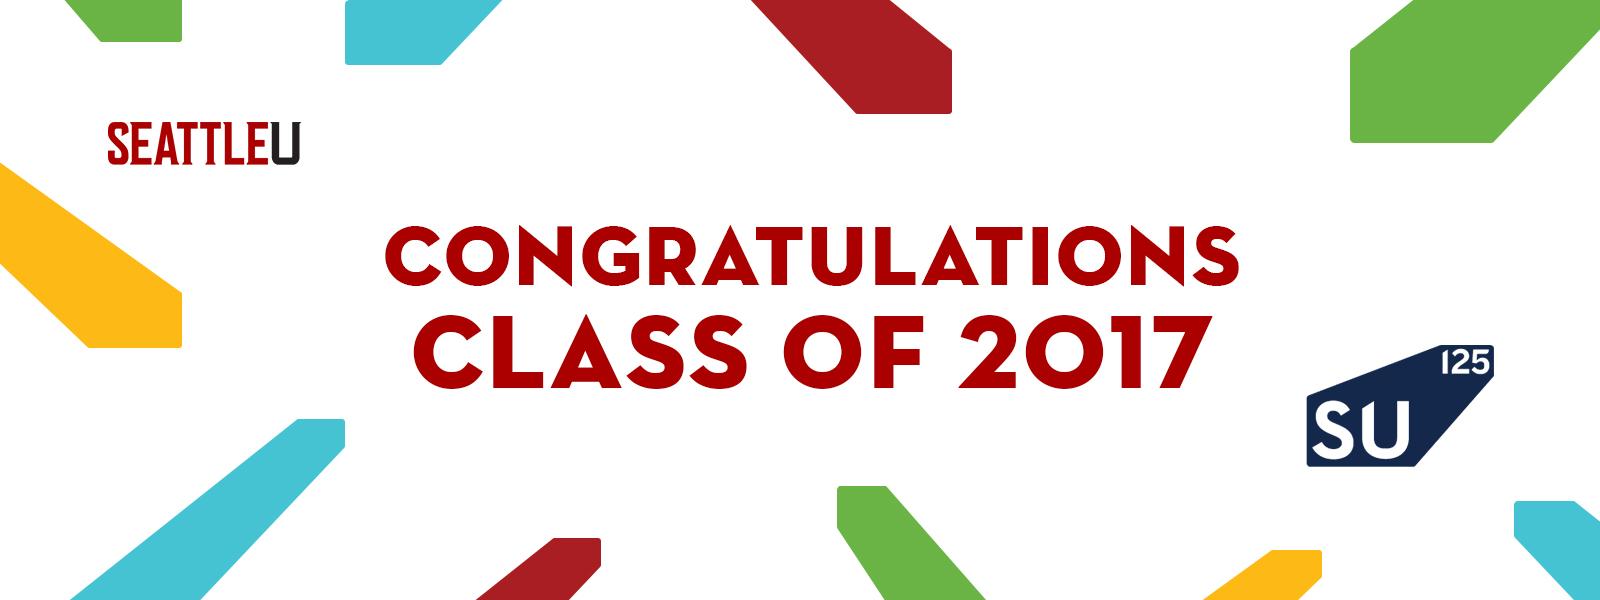 Banner congratulating the class of 2017